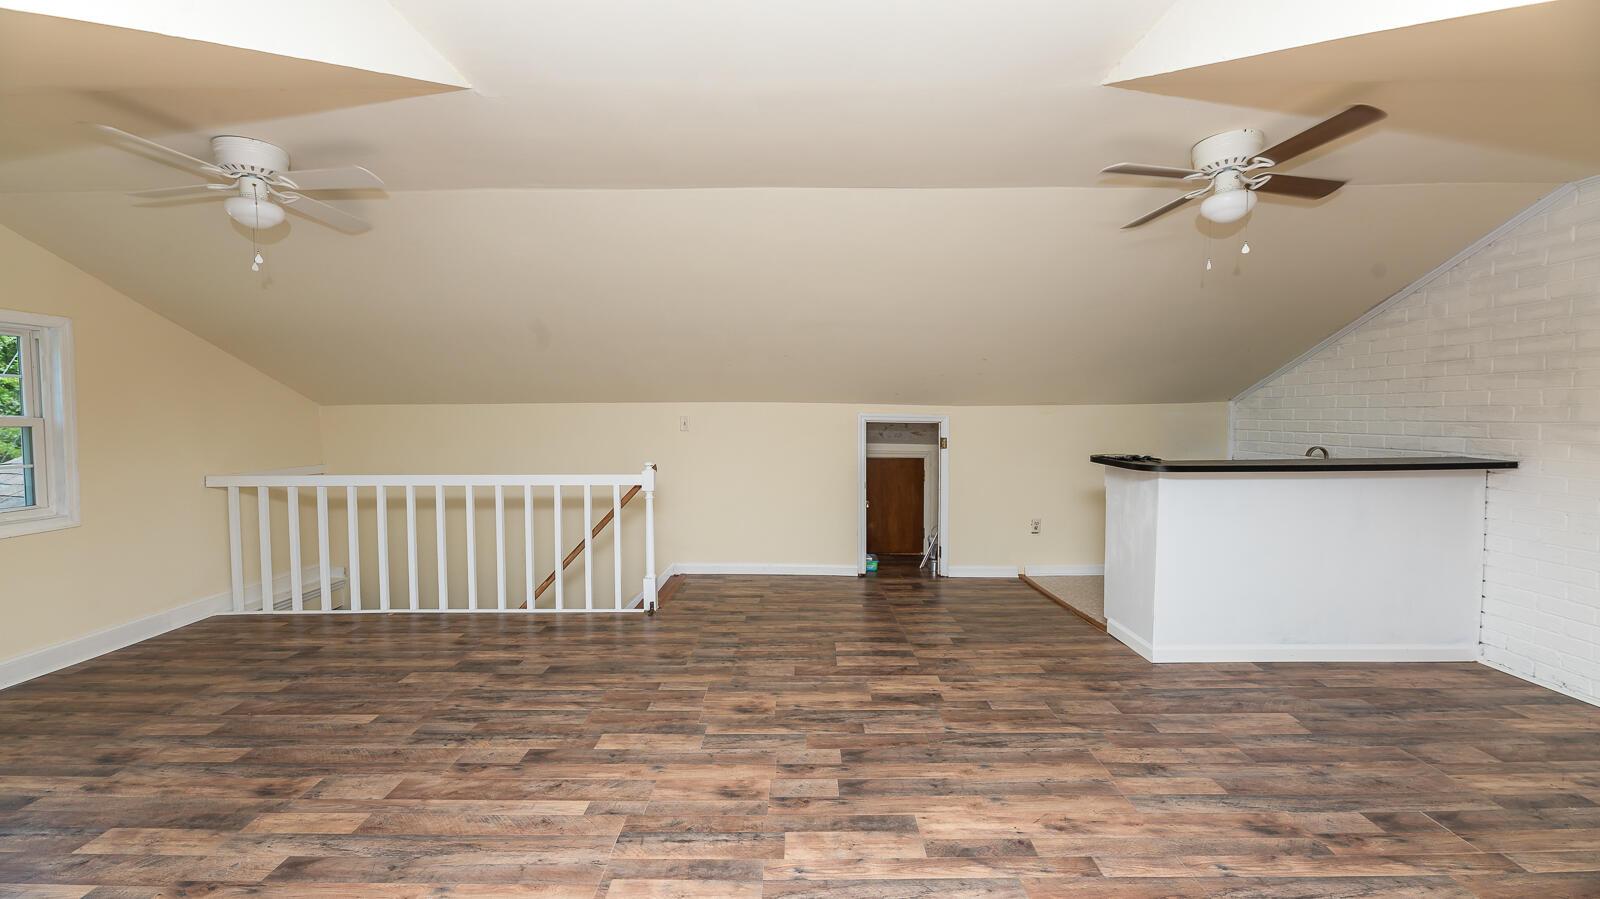 Ashley Villas Homes For Sale - 4315 Briarstone, North Charleston, SC - 3